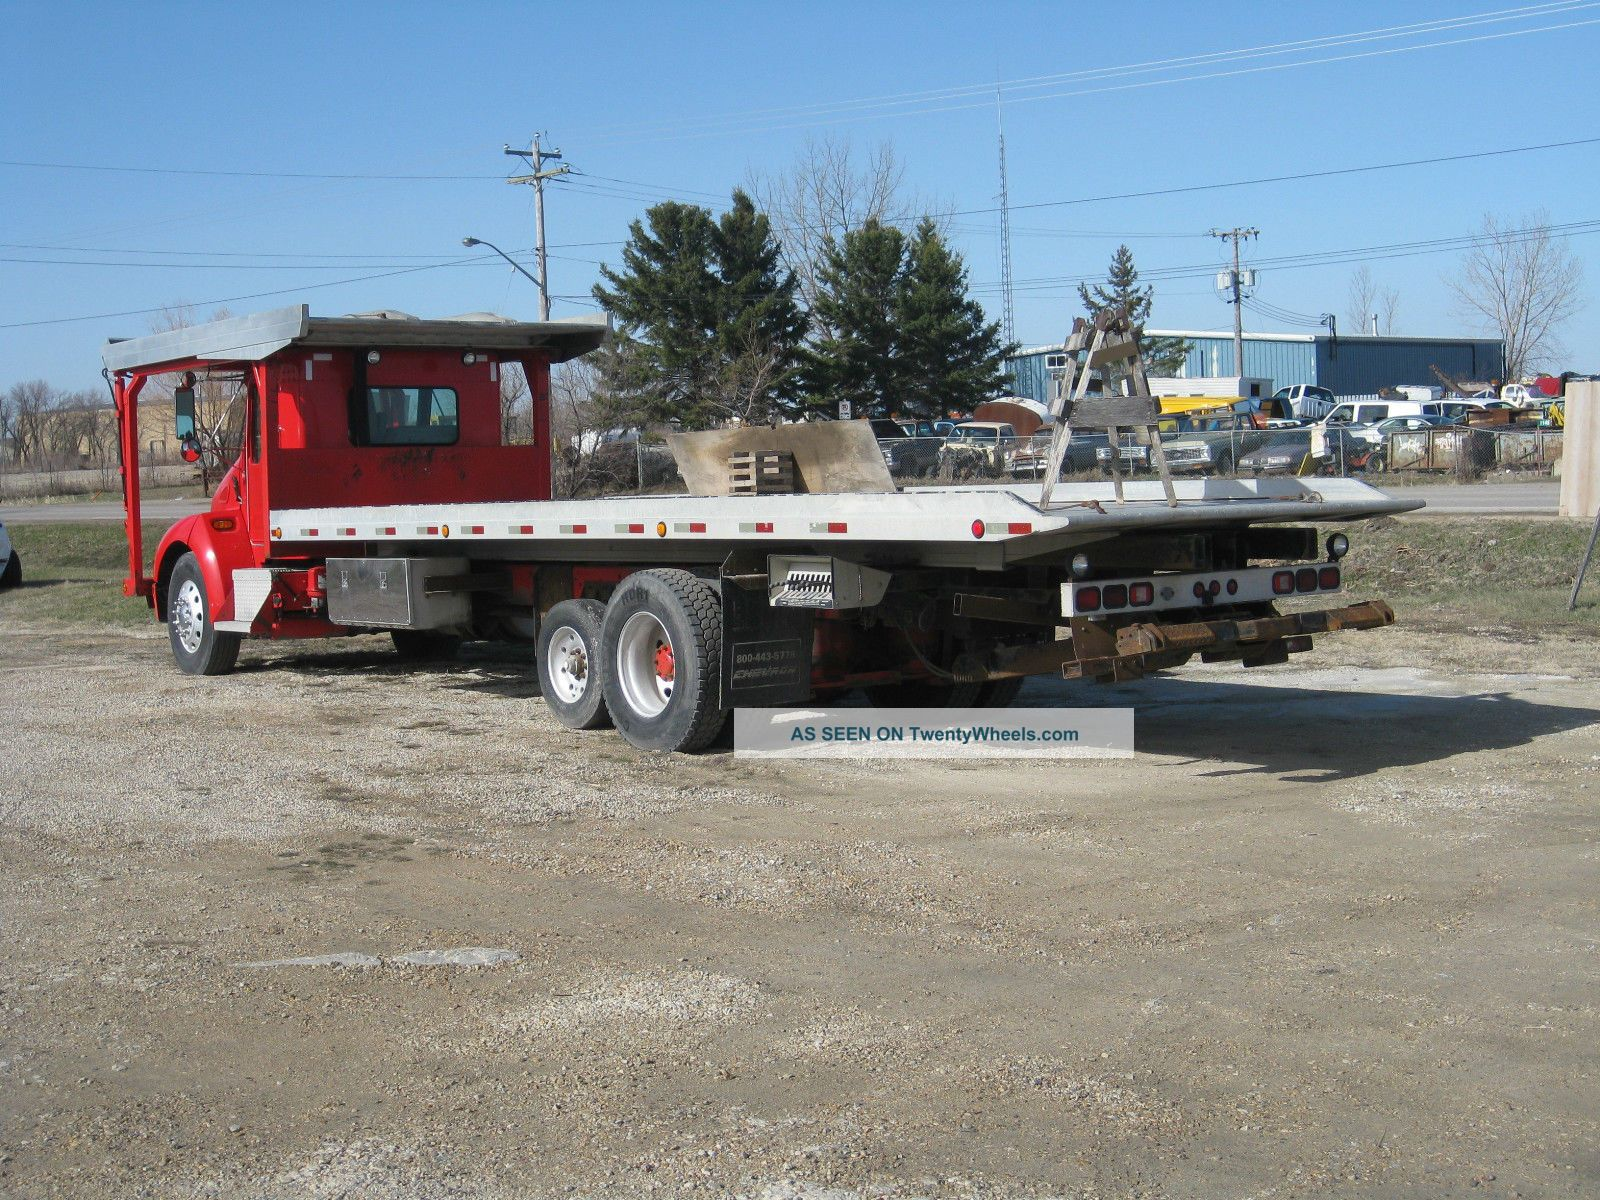 T300 Kenworth Up To 4 Car Hauler Other Heavy Duty Trucks photo